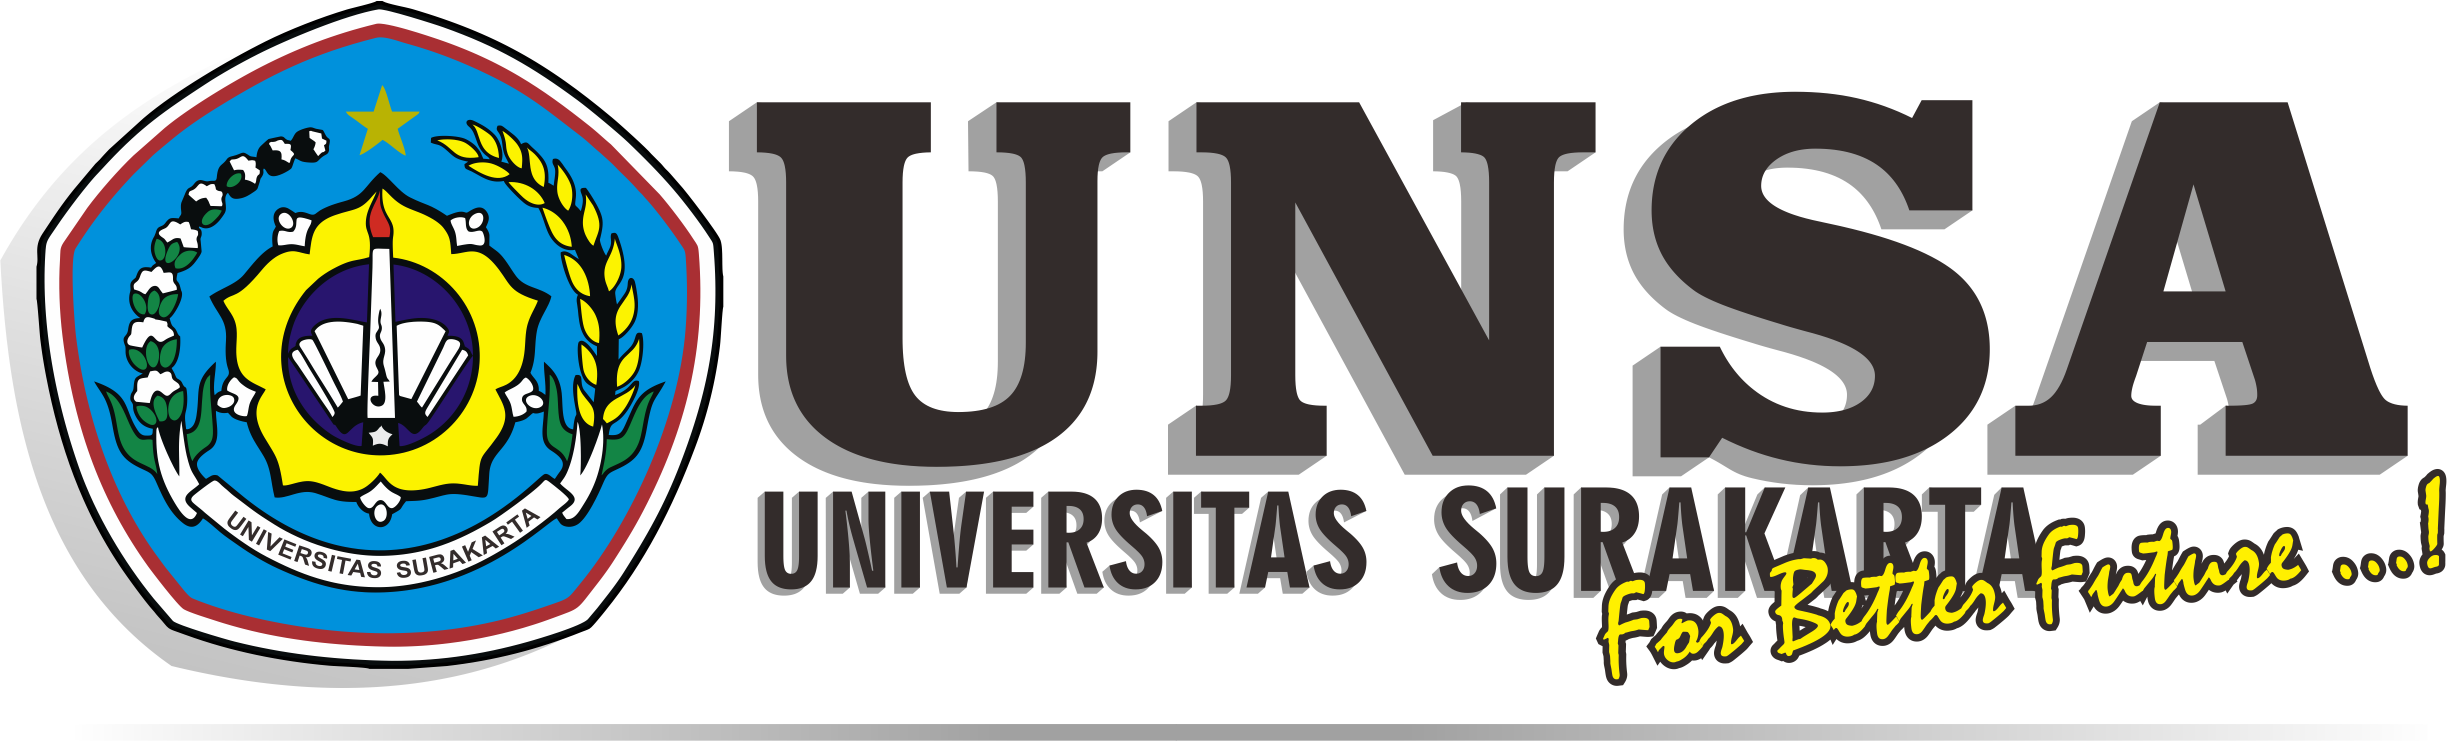 UNIVERSITAS SURAKARTA